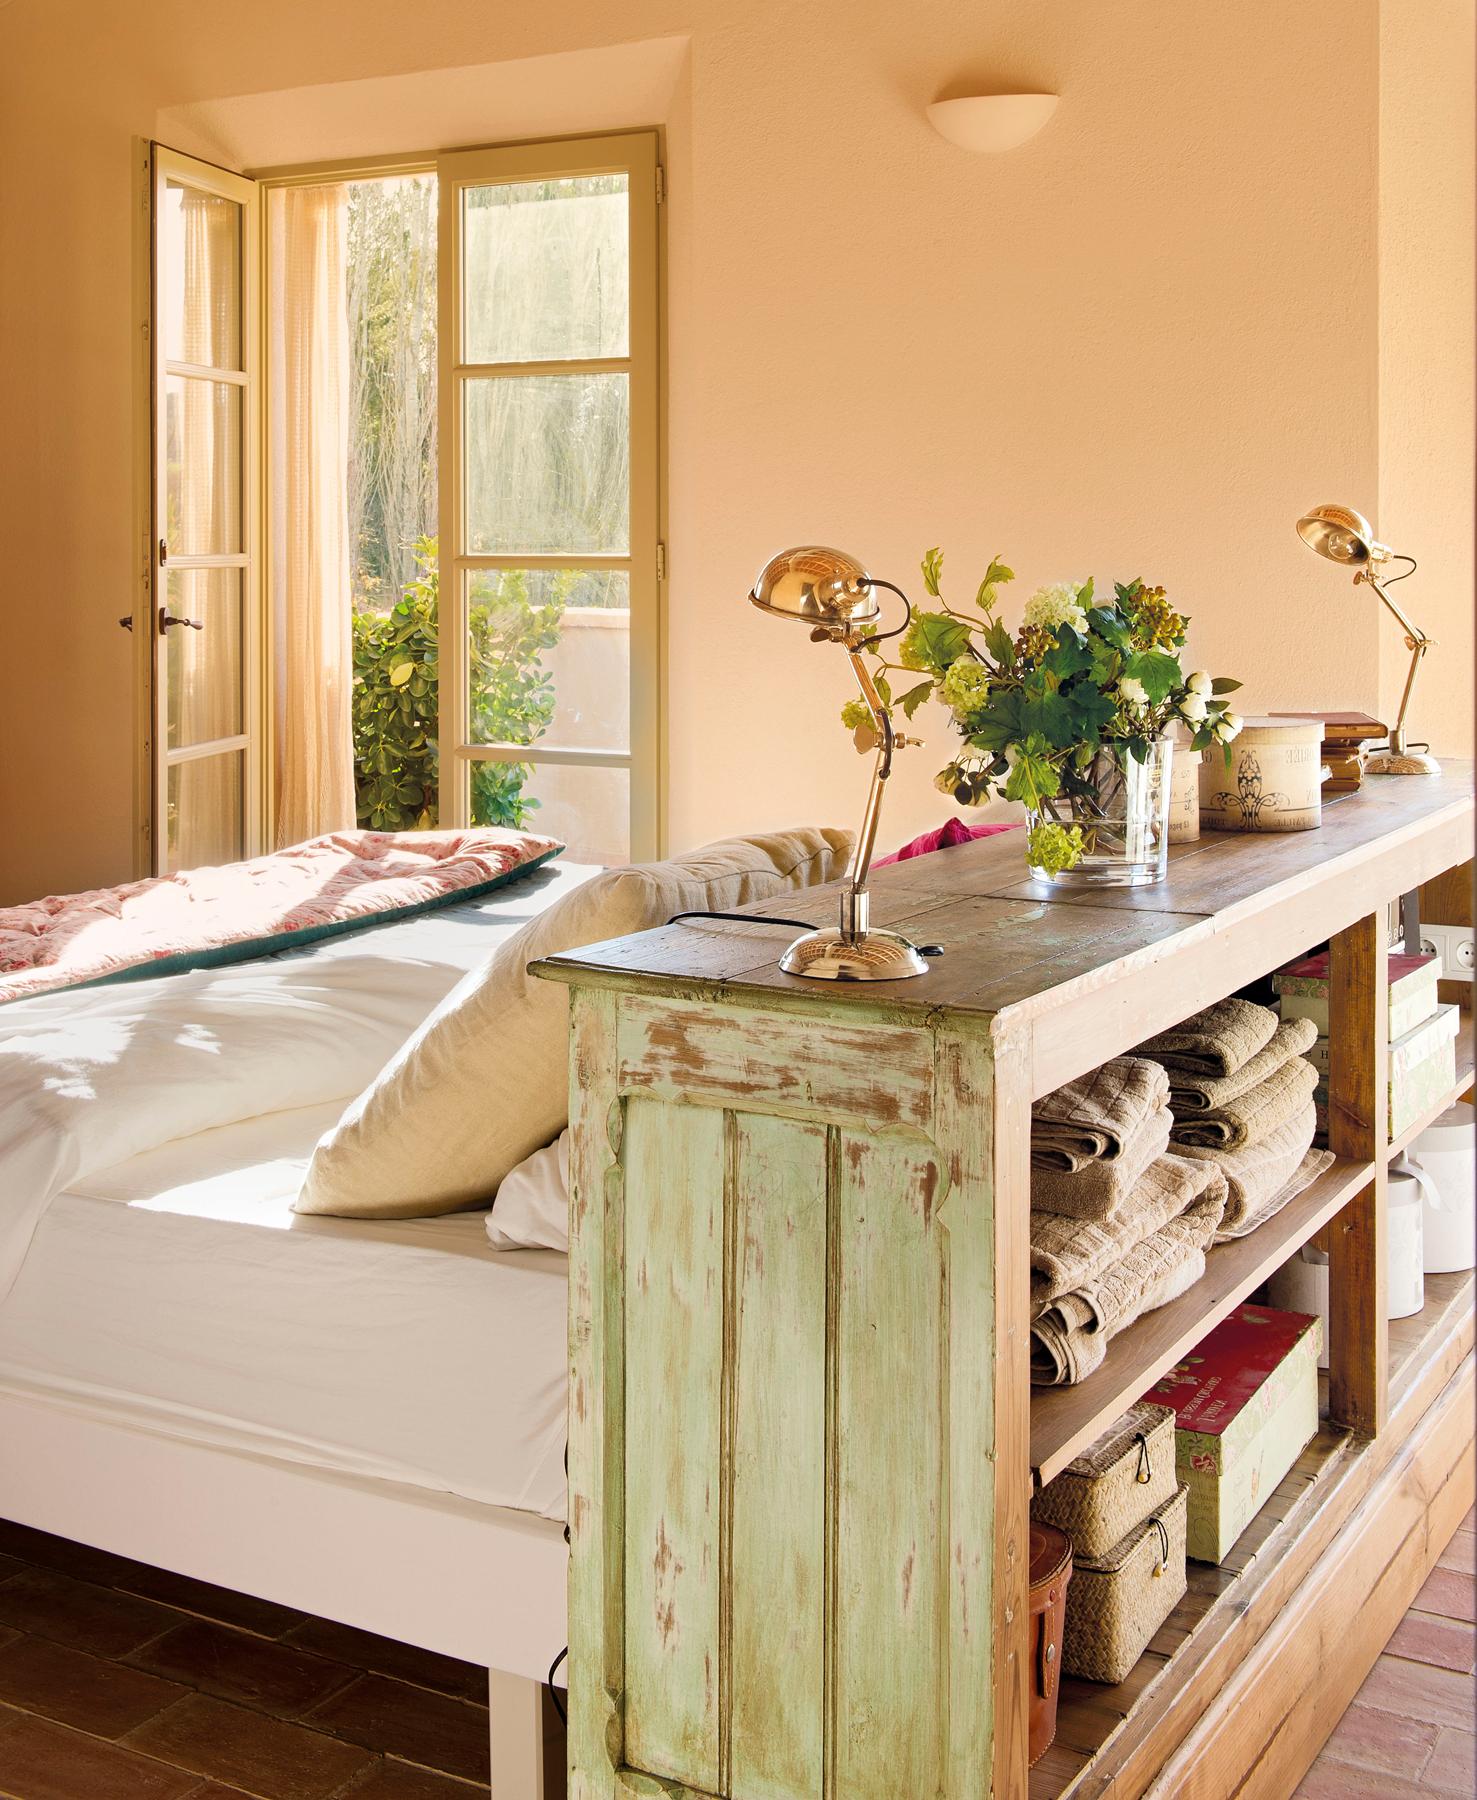 4 Opciones Para Restaurar Muebles De Madera H9d9 Mi Casa Cada Dà A Mejor 20 Ideas Para Un Cambio Exprà S